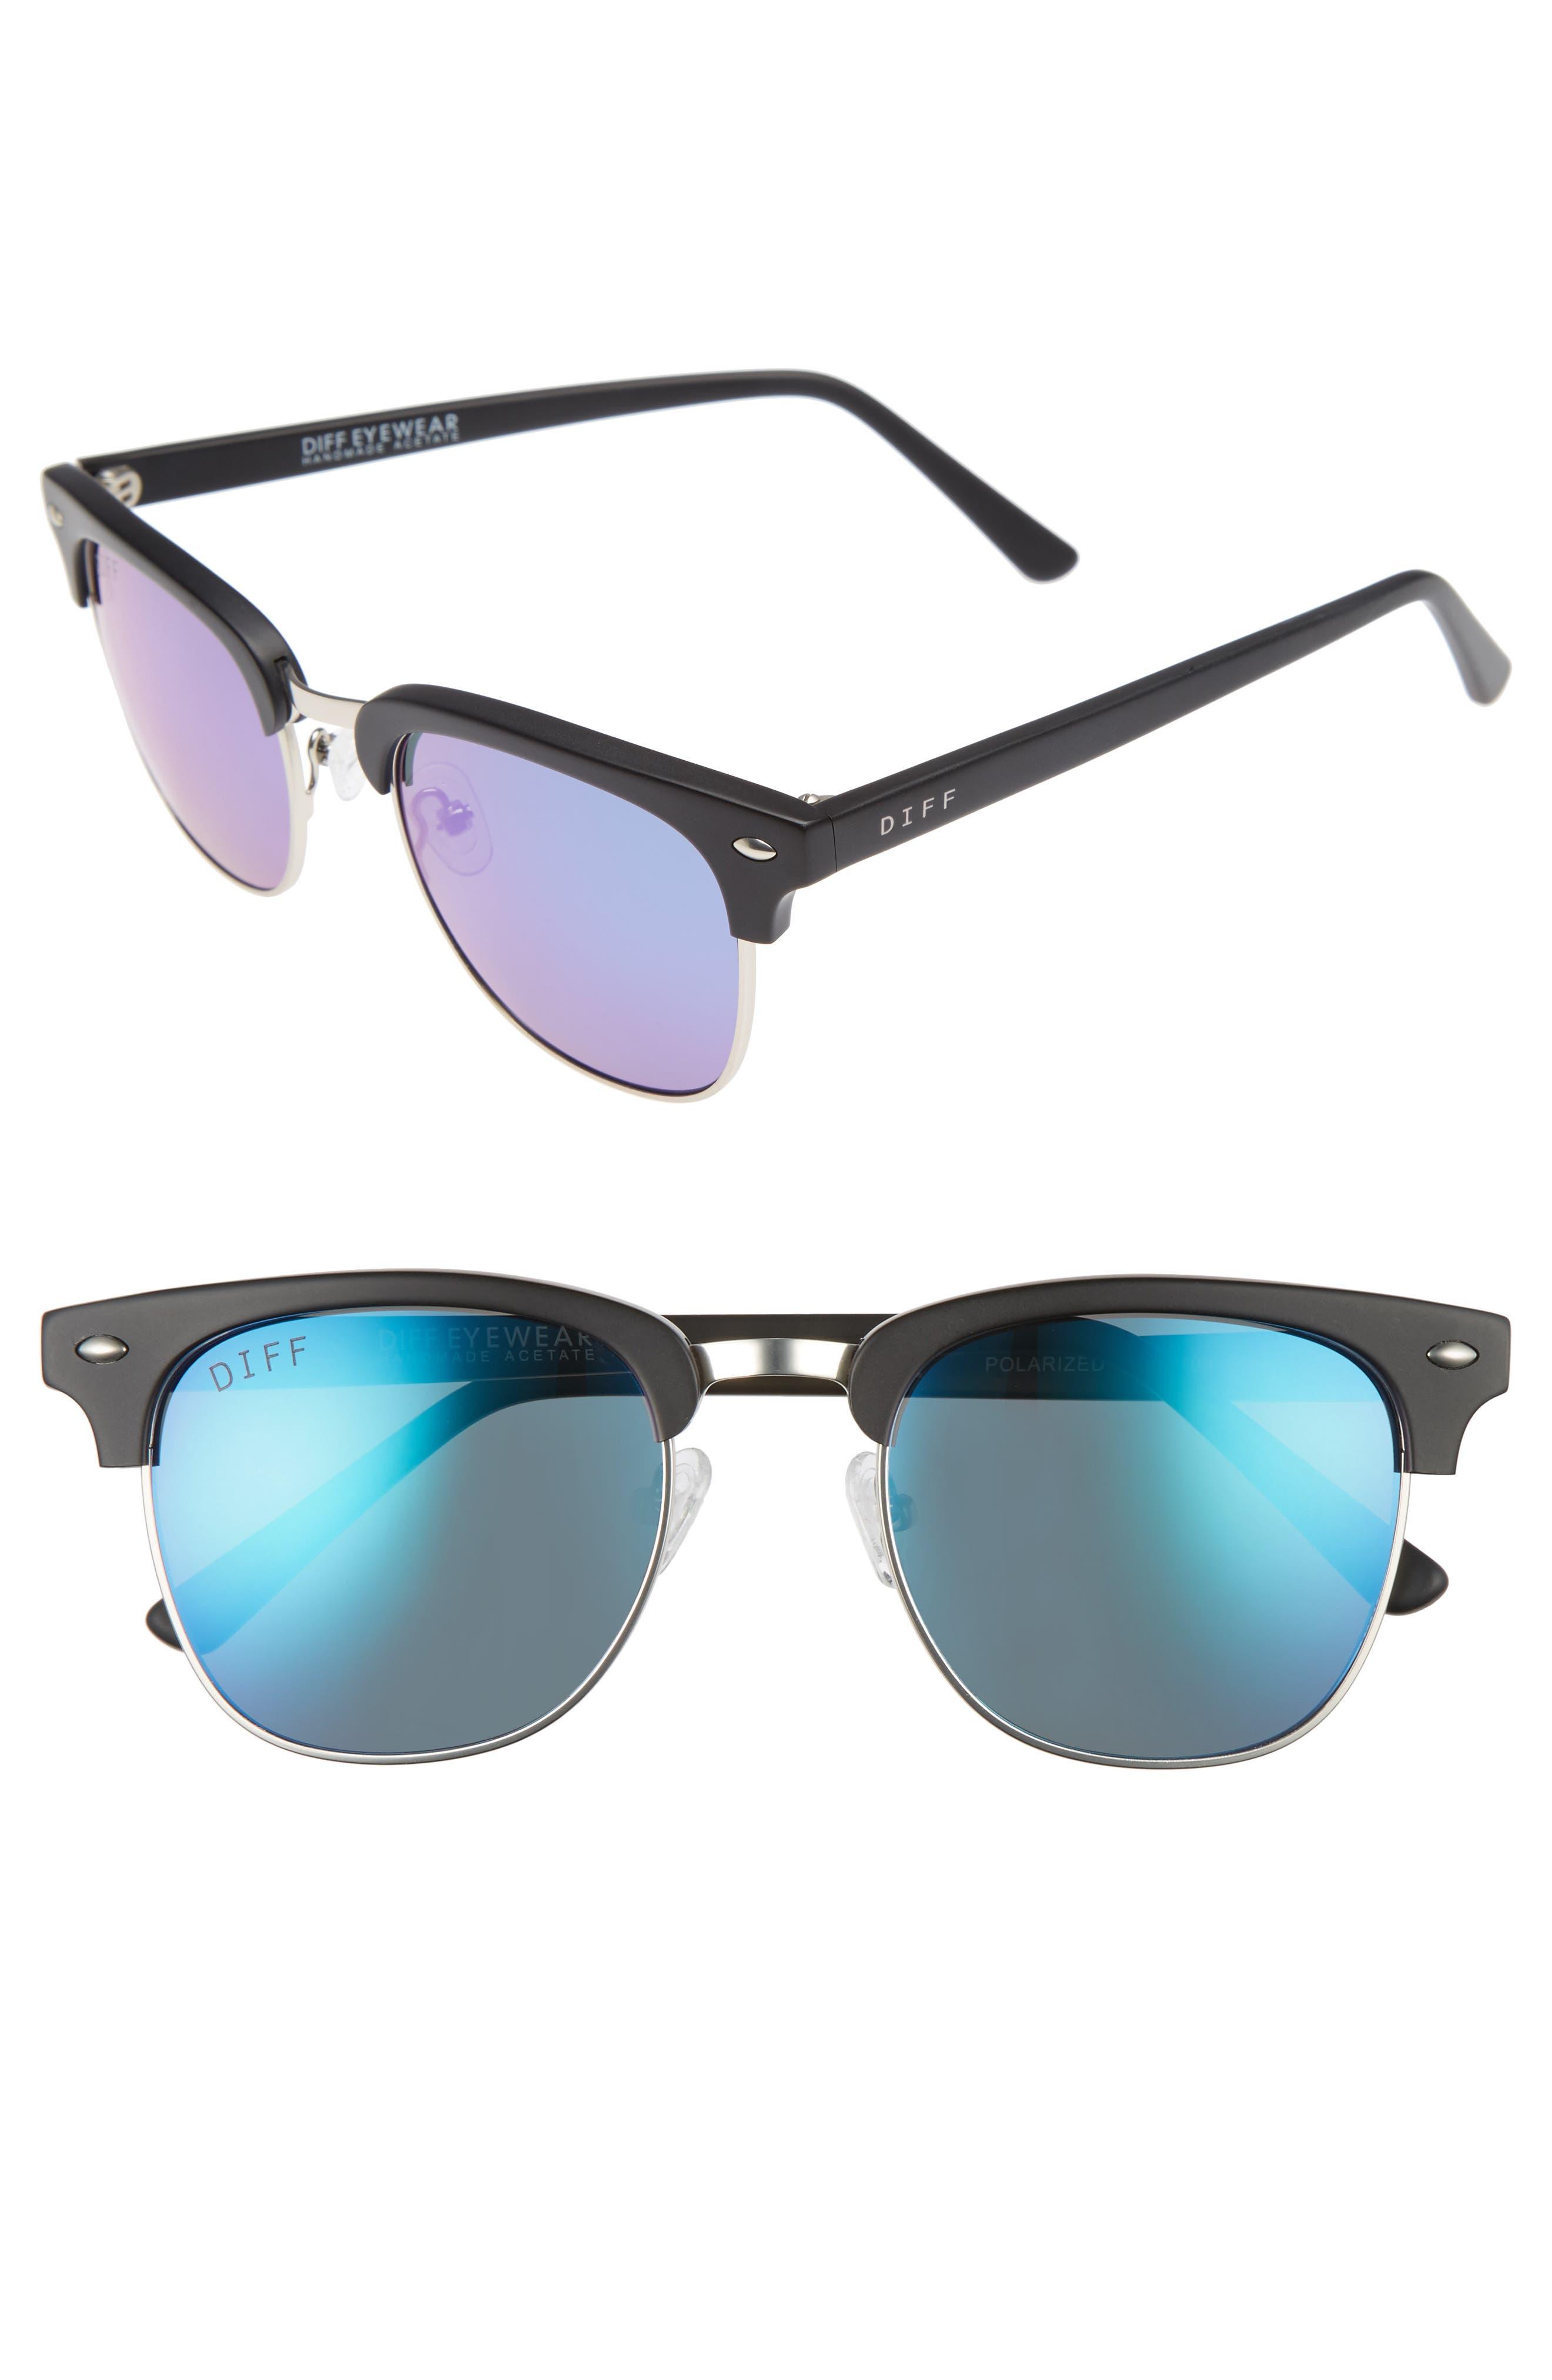 Barry 51mm Polarized Retro Sunglasses,                         Main,                         color,